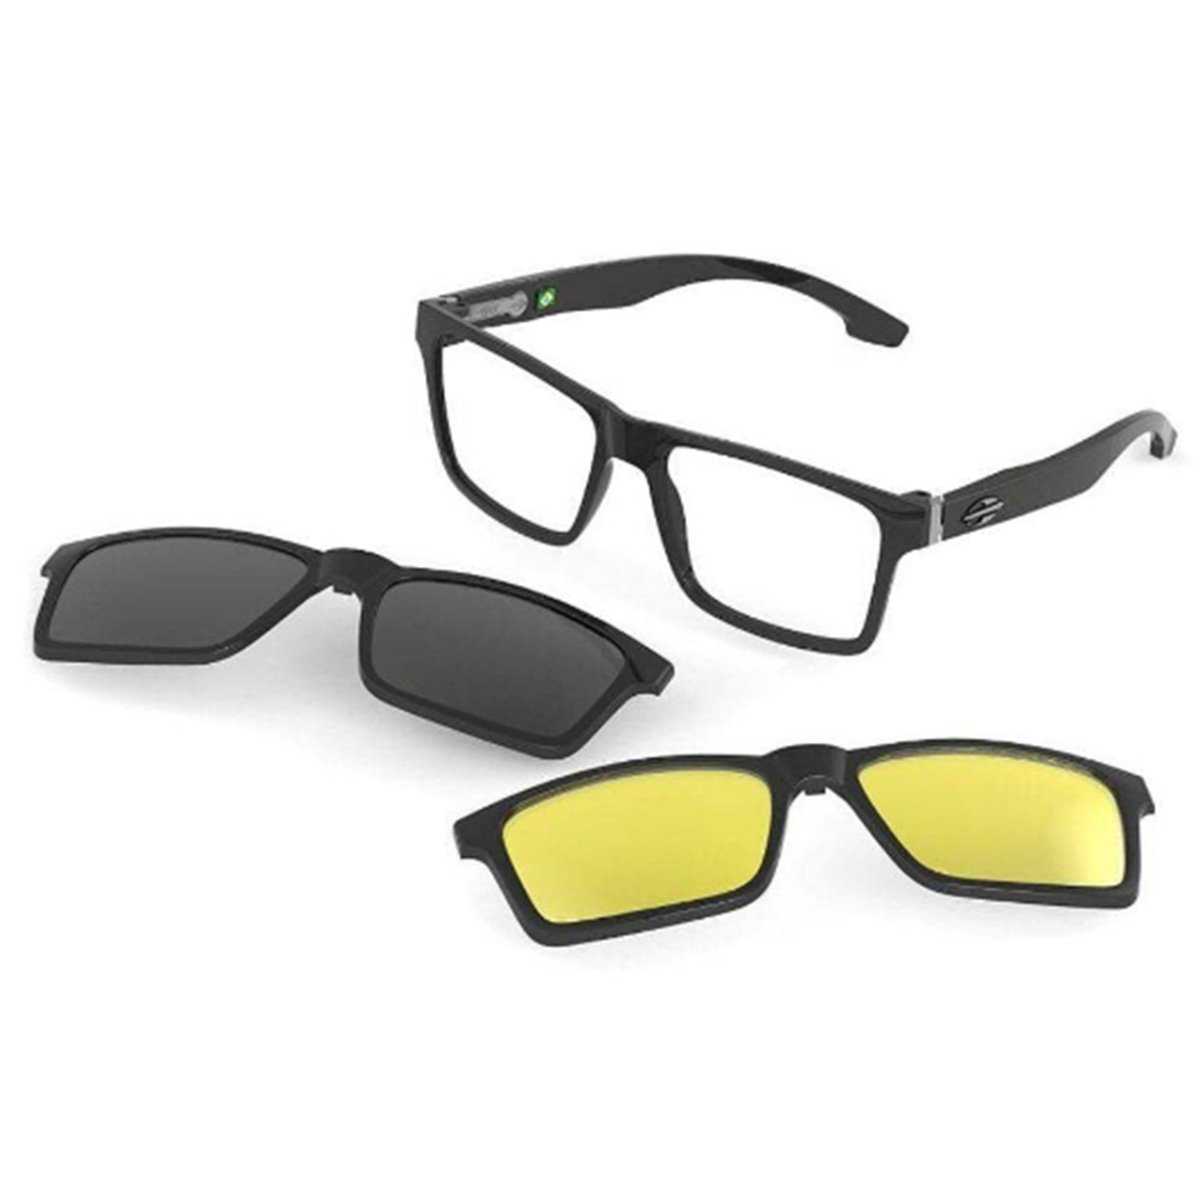 8d9c002327406 Compre Óculos de Grau Mormaii Swap Clip On em 10X   Tri-Jóia Shop